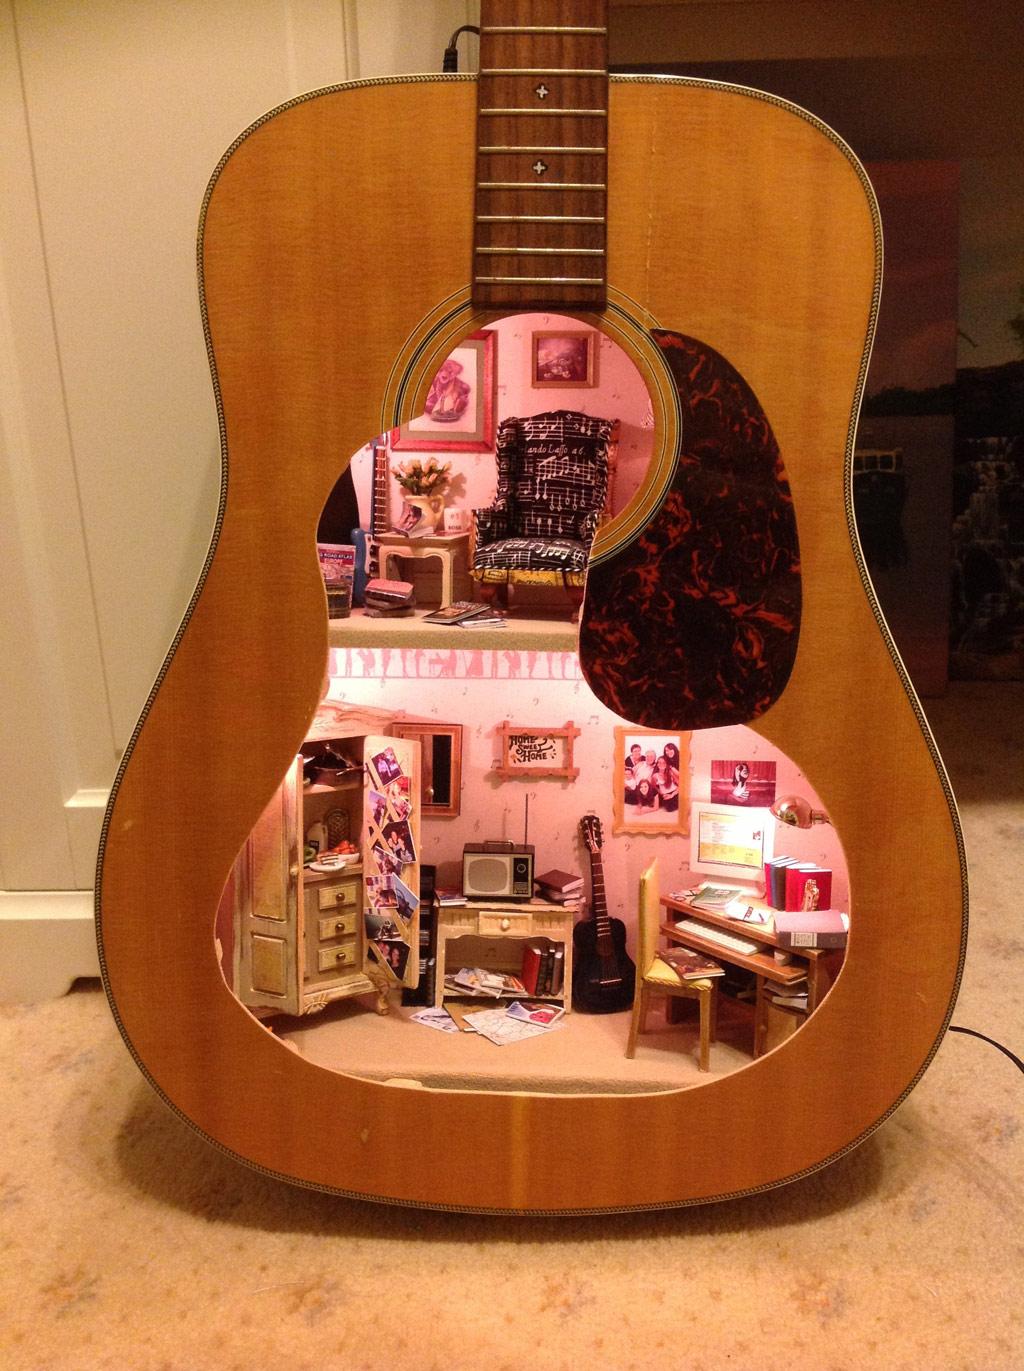 http://www.dollshouse.com/sector/171/2013-2014-collector's-handbook